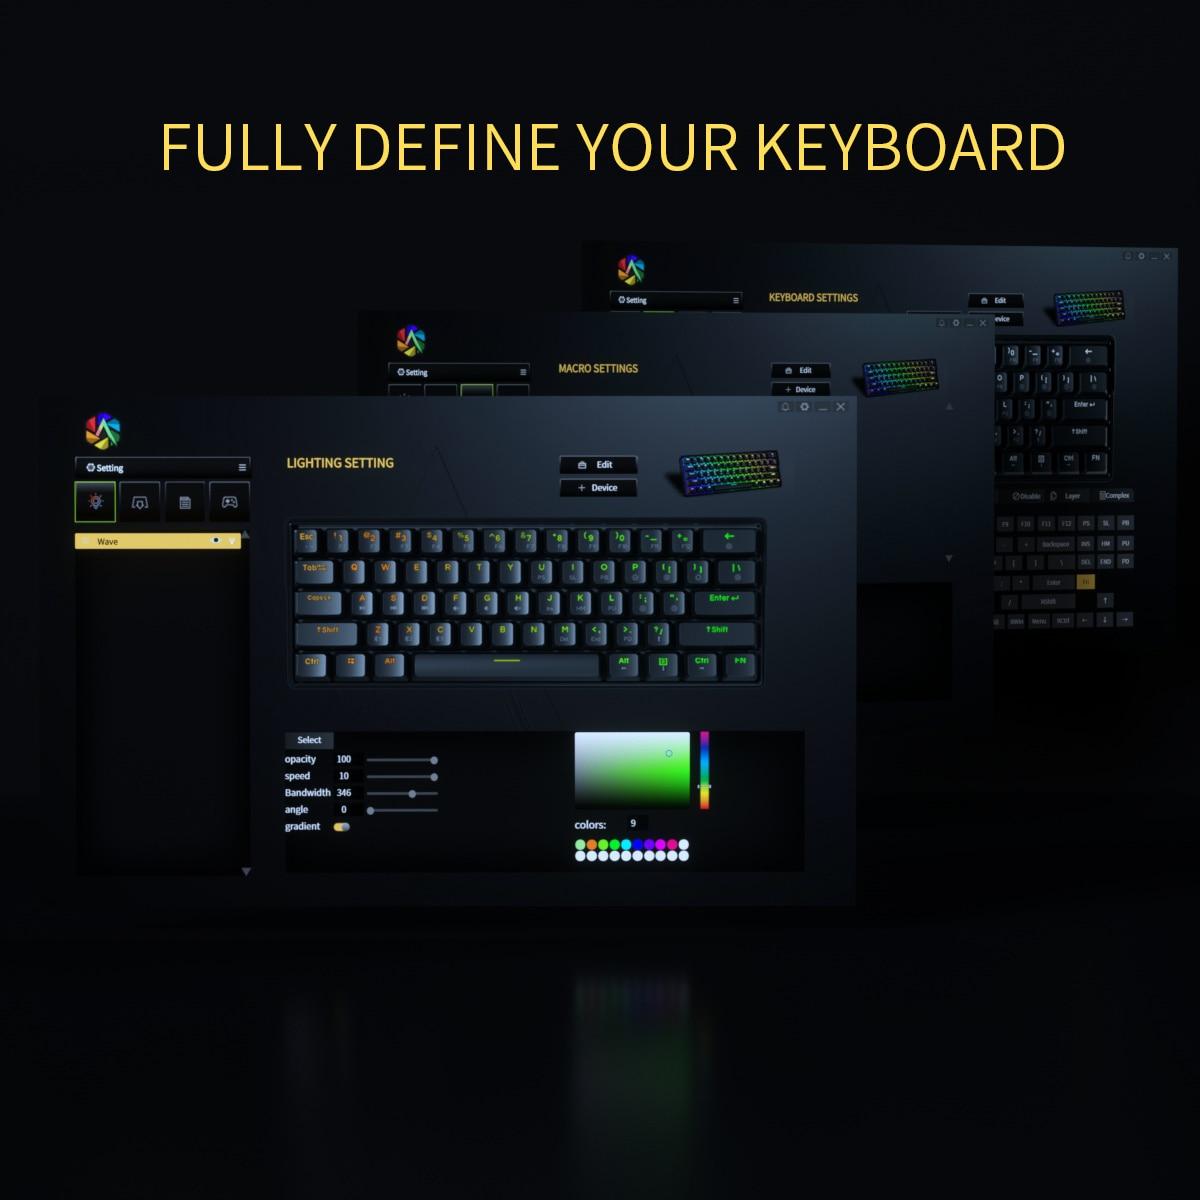 Купить с кэшбэком KEMOVE RGB Mechanical Keyboard White Gateron Hot-swappable Switch 5.1 Bluetooth USB 60% Gaming Keyboard PBT Keycaps Backlight